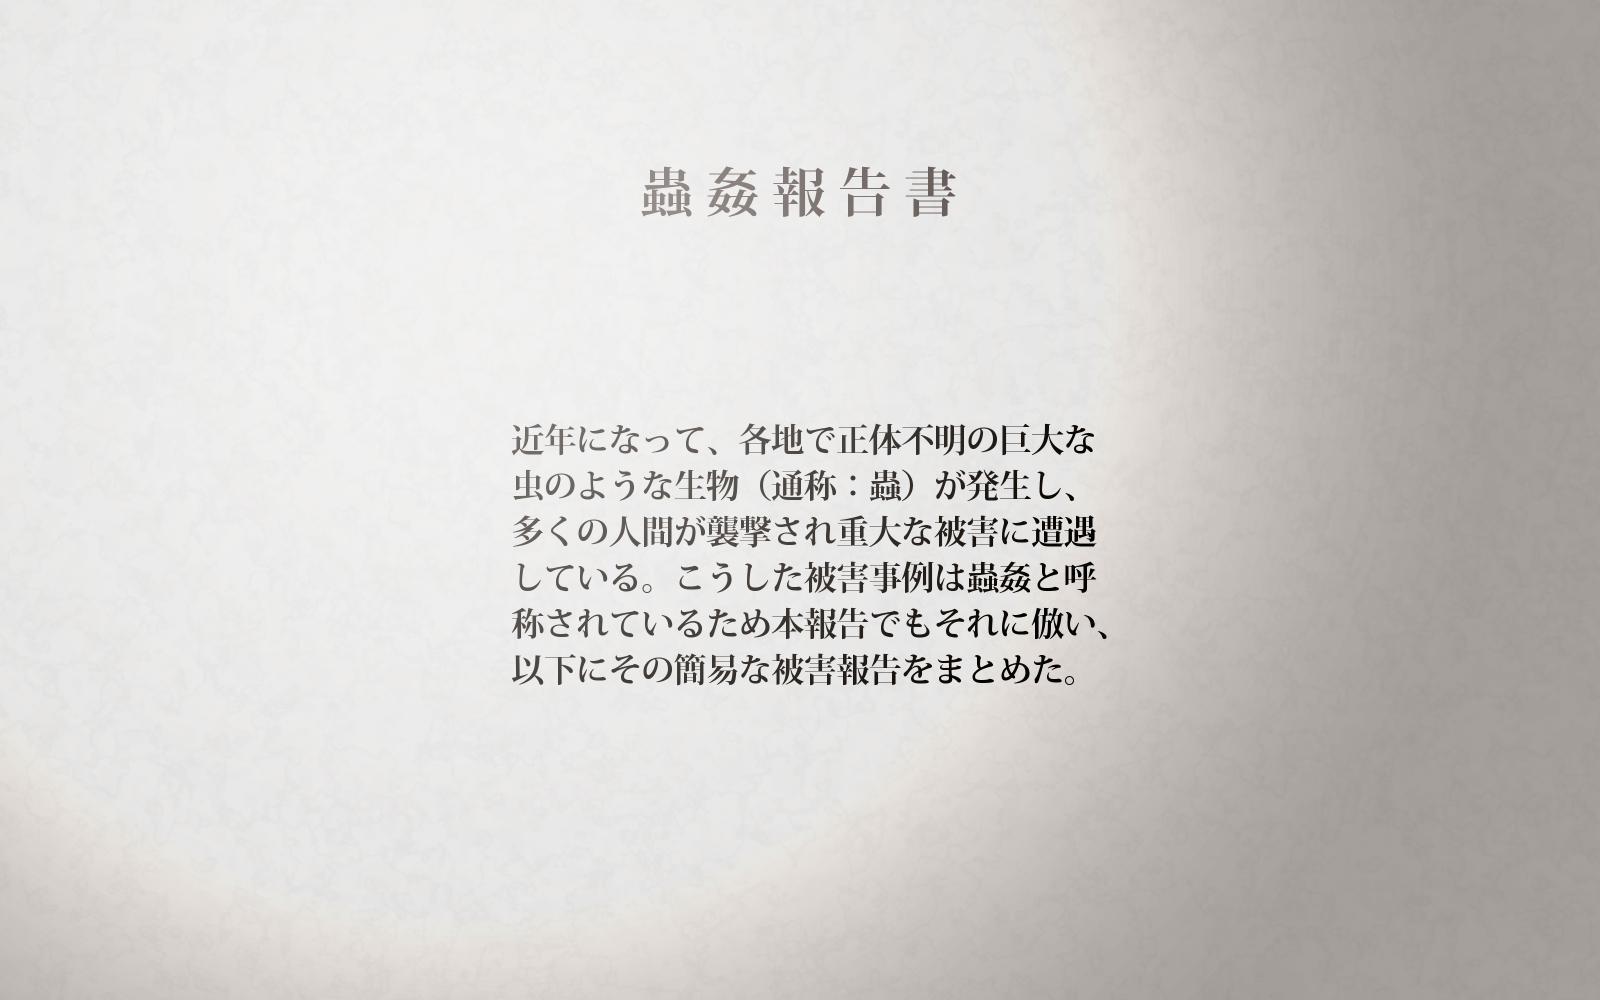 Chuukan Houkokusho 0